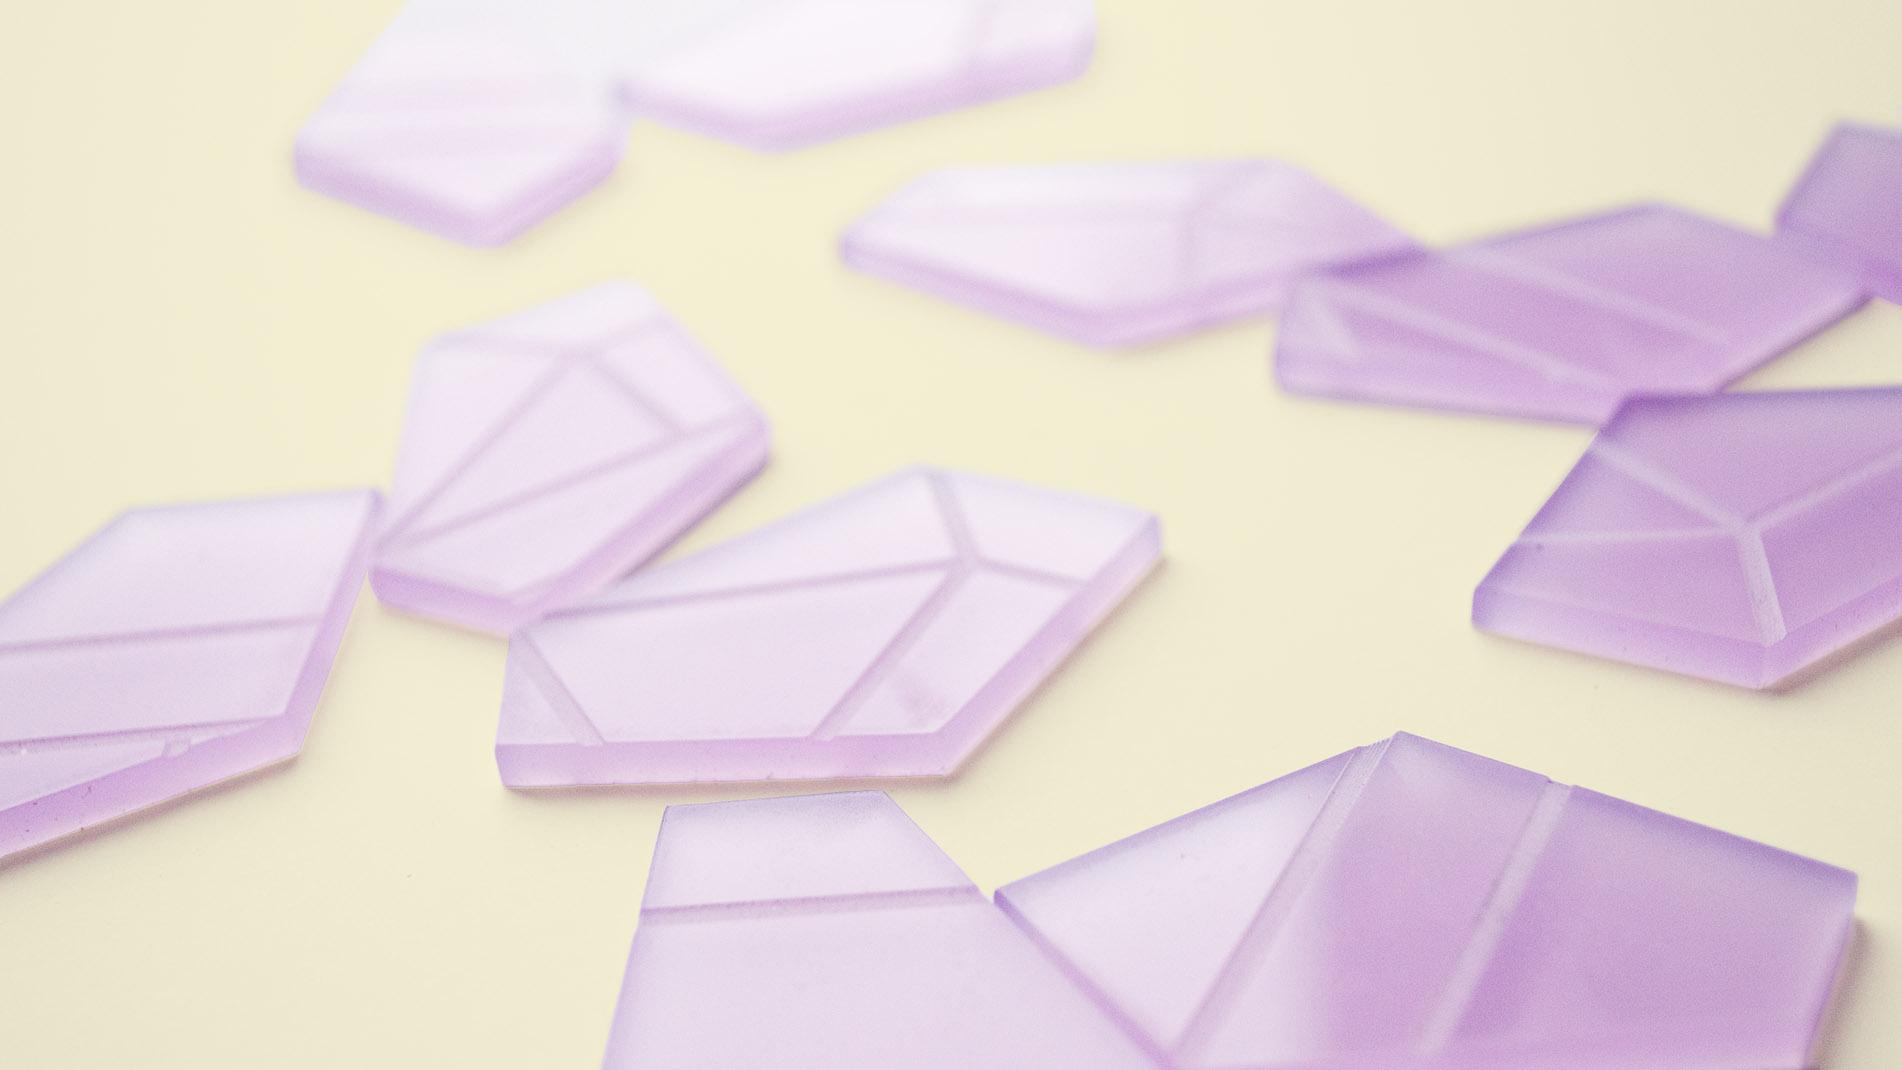 purple-amy-large-width-rectangle